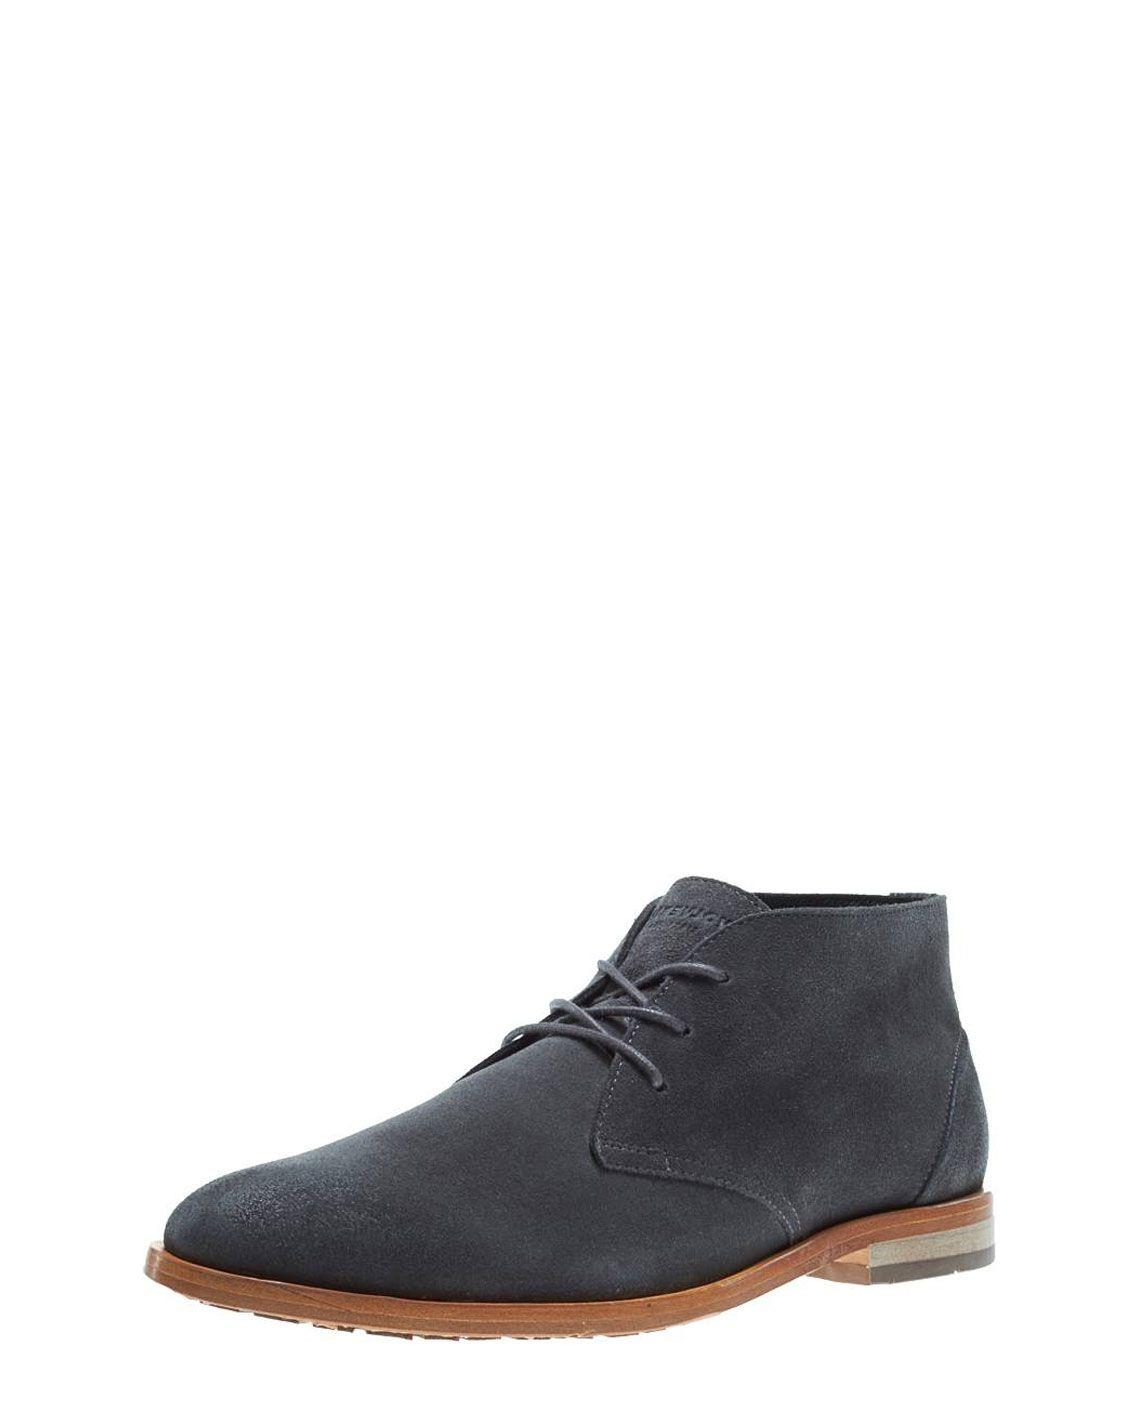 0514a857f24 Wolverine Marco Chukka Grey Suede – Rowan Sky | Fashion | Boots ...